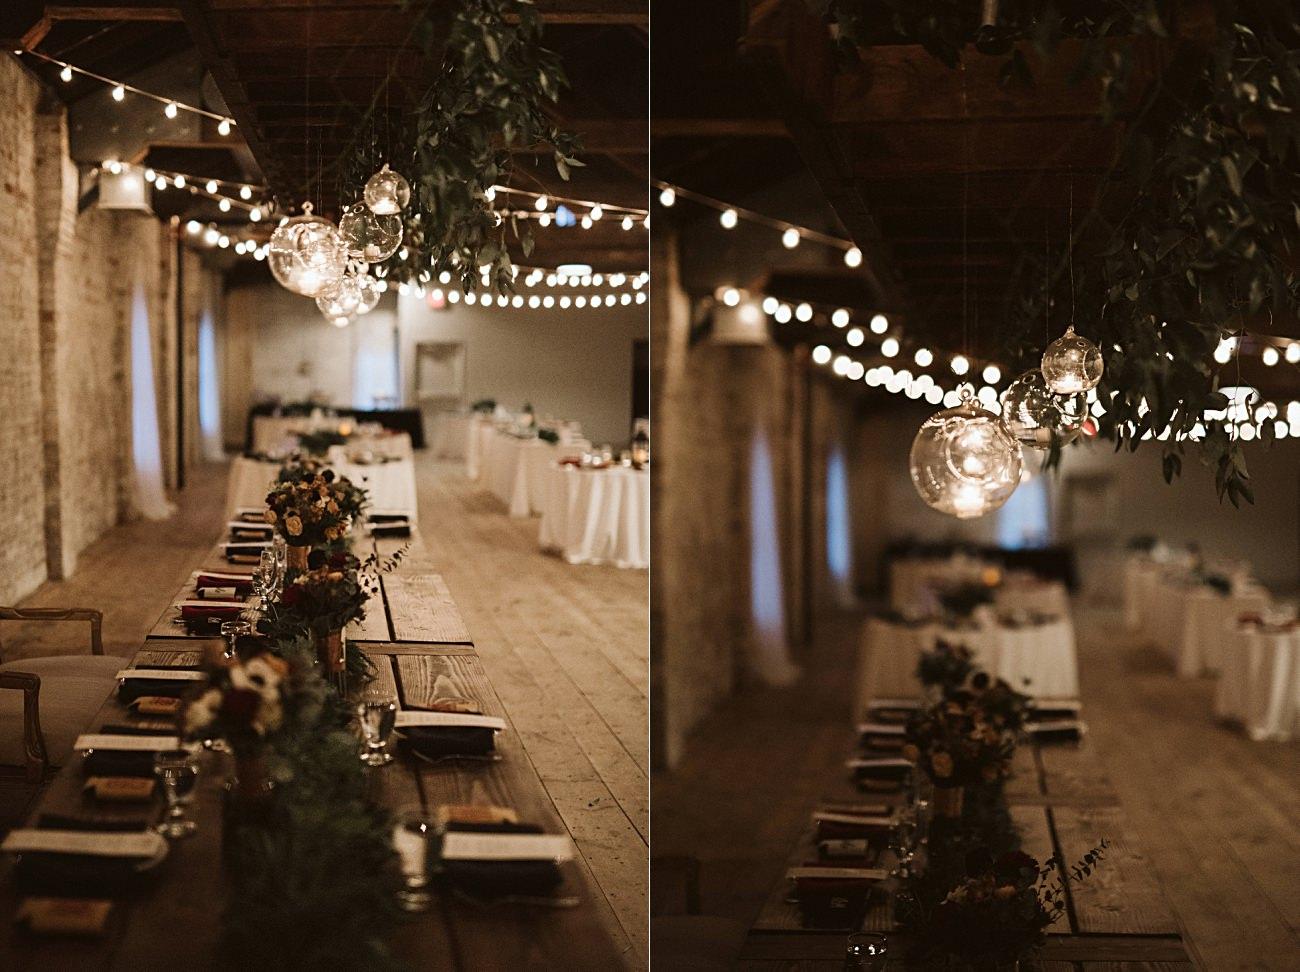 Candlelit Wedding Reception, Winter Wedding, Lageret Wedding in Stoughton Wisconsin, Fall Wedding, Madison WI Wedding, Industrial Wedding, Moody Wedding, floral bridesmaid dress,